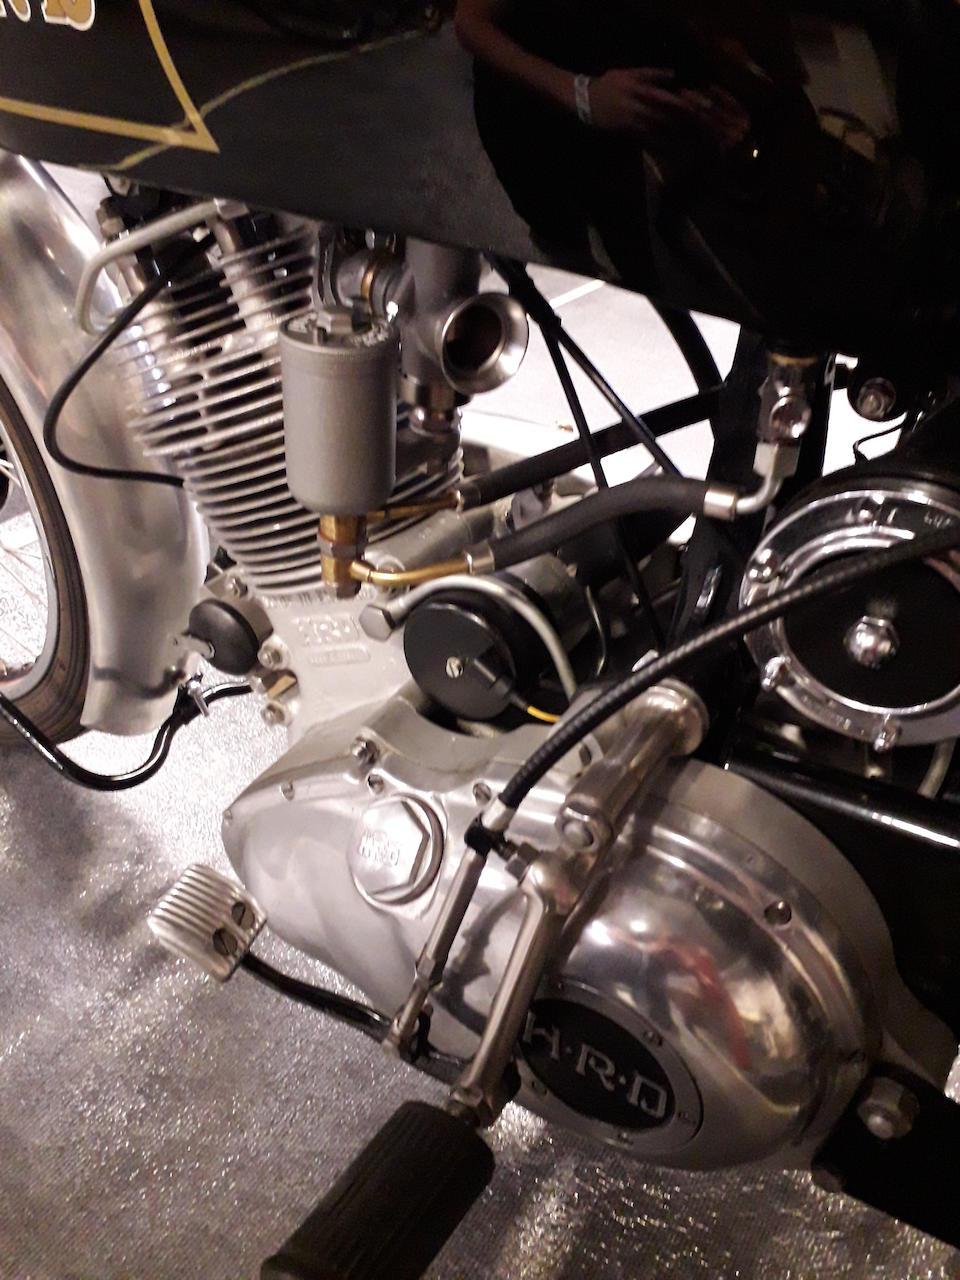 1949 Vincent-HRD 500cc Series-B Meteor Frame no. R/1/4884  Engine no. F5AB/2/2984 Crankcase mating nos. 40A / 40A